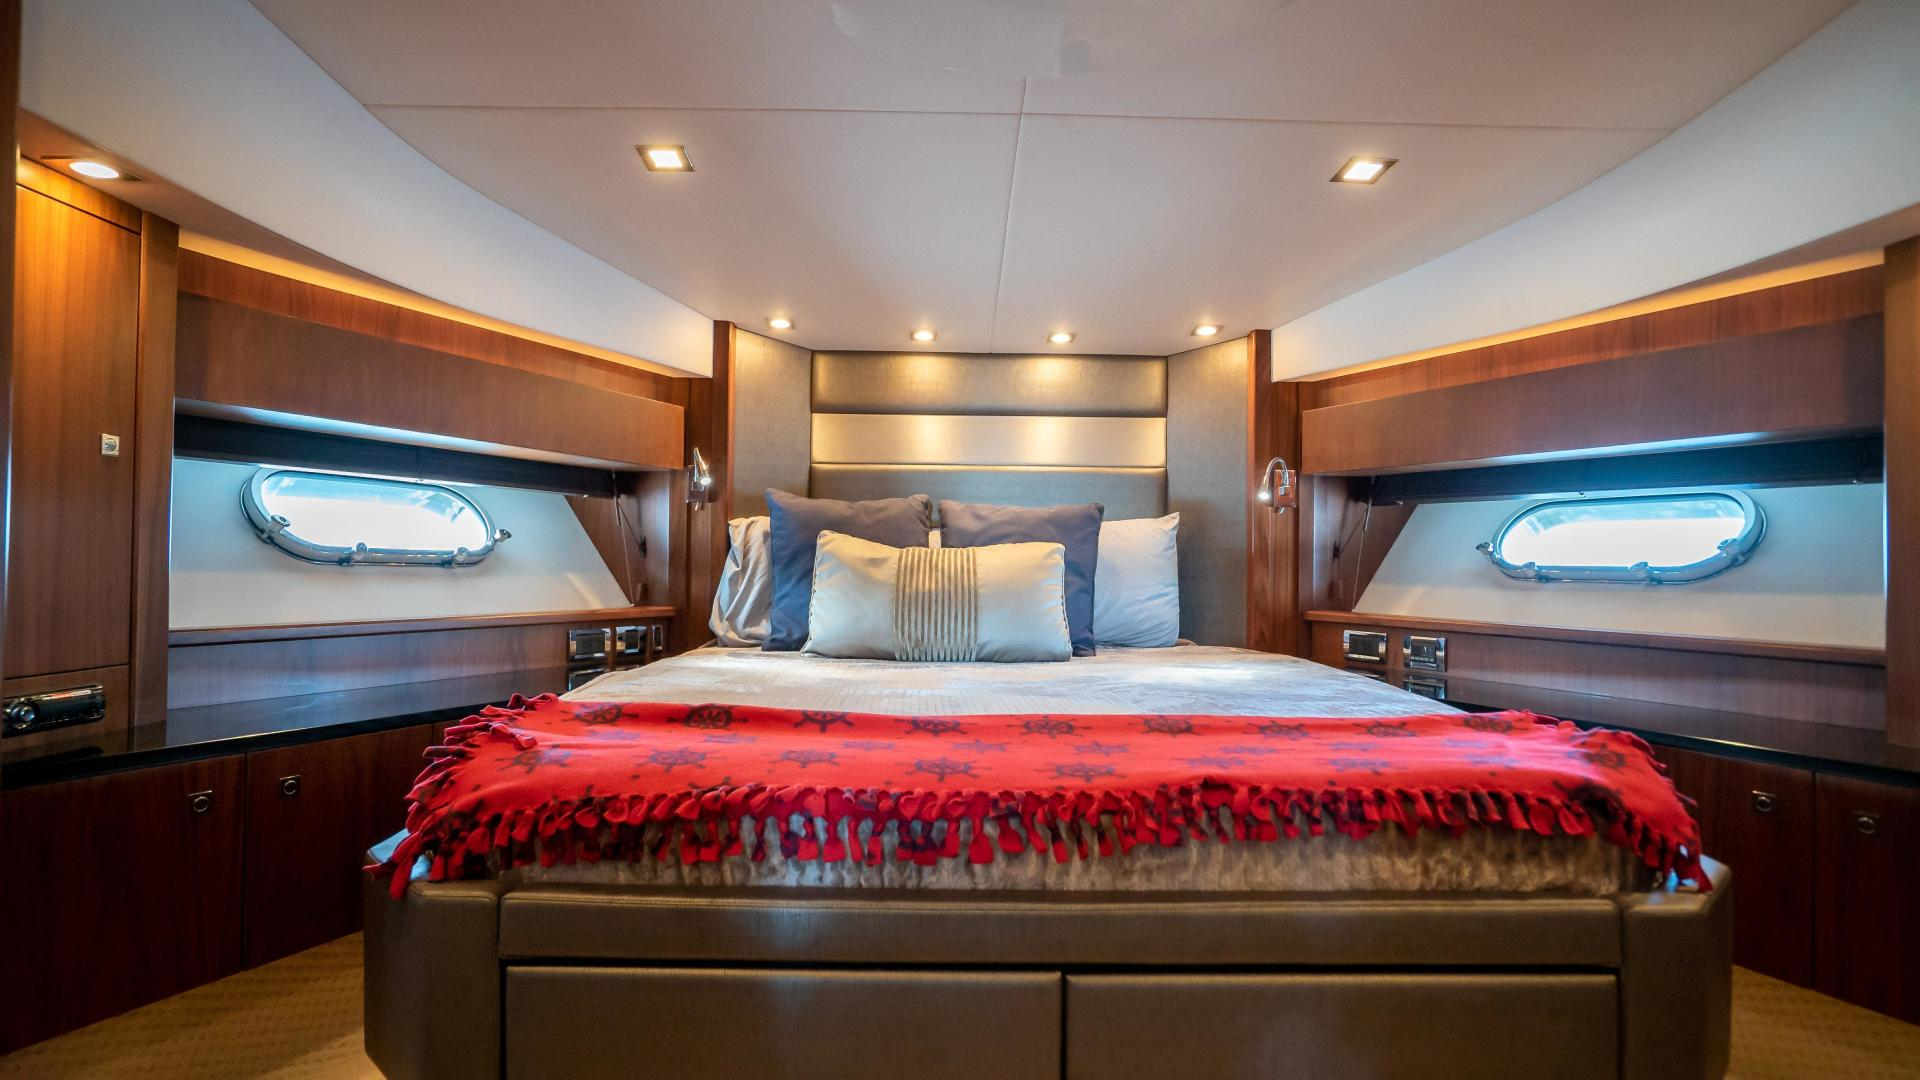 Sunseeker-Motor yacht 2012-JIMBO New Port-Rhode Island-United States-1480200   Thumbnail